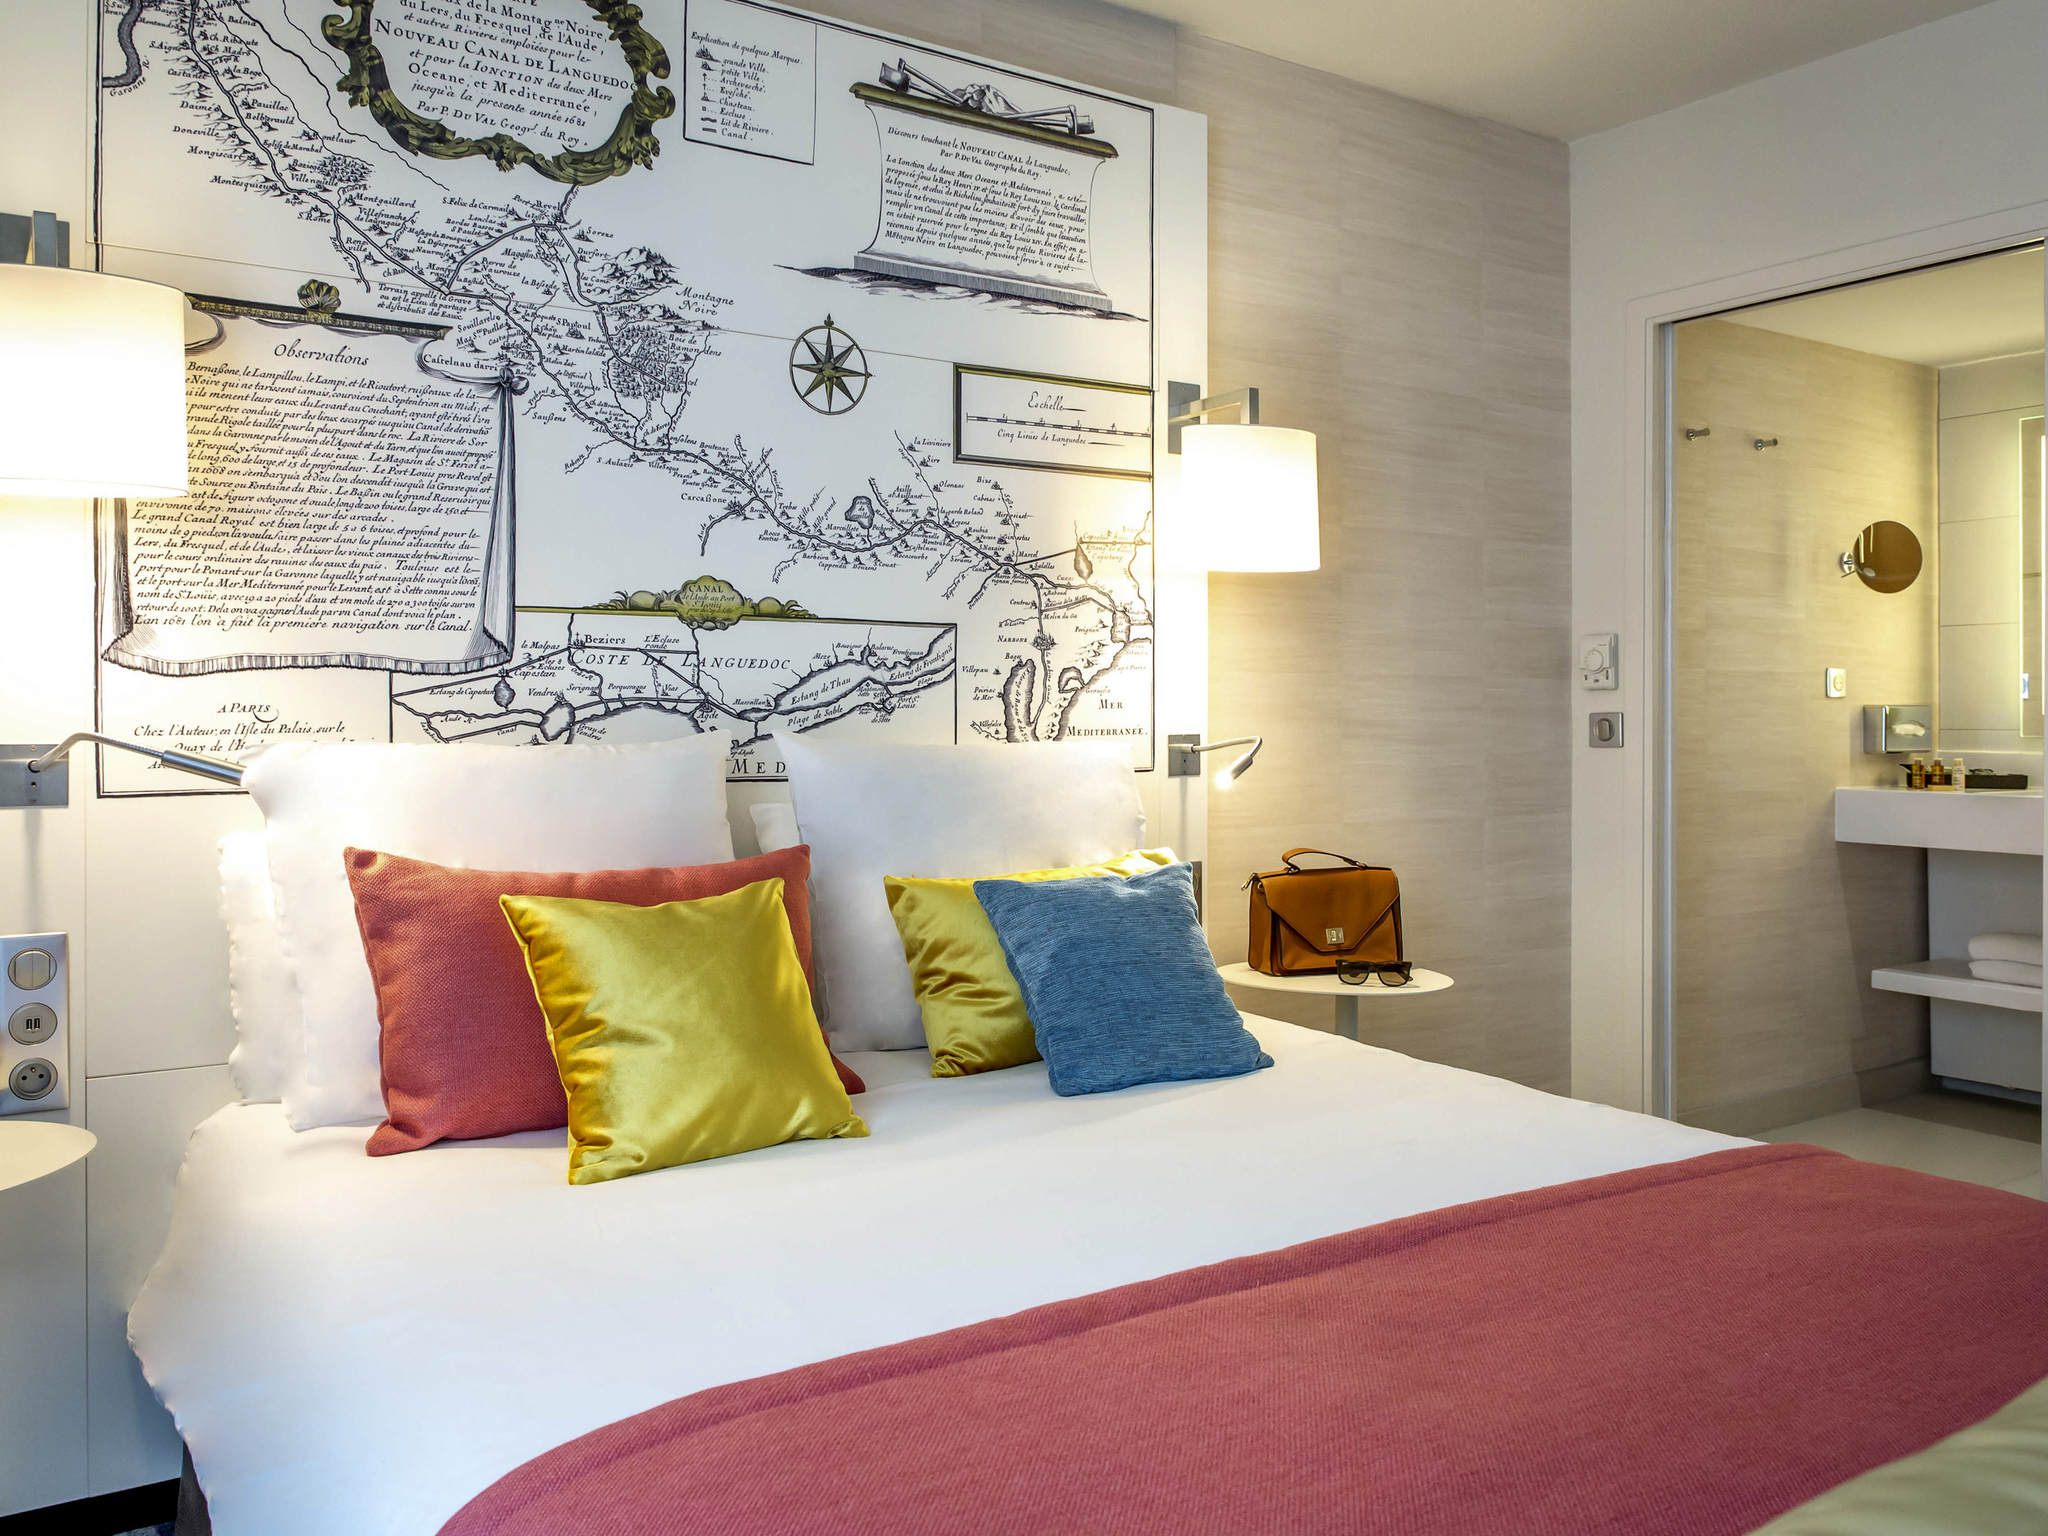 فندق - Hôtel Mercure Béziers